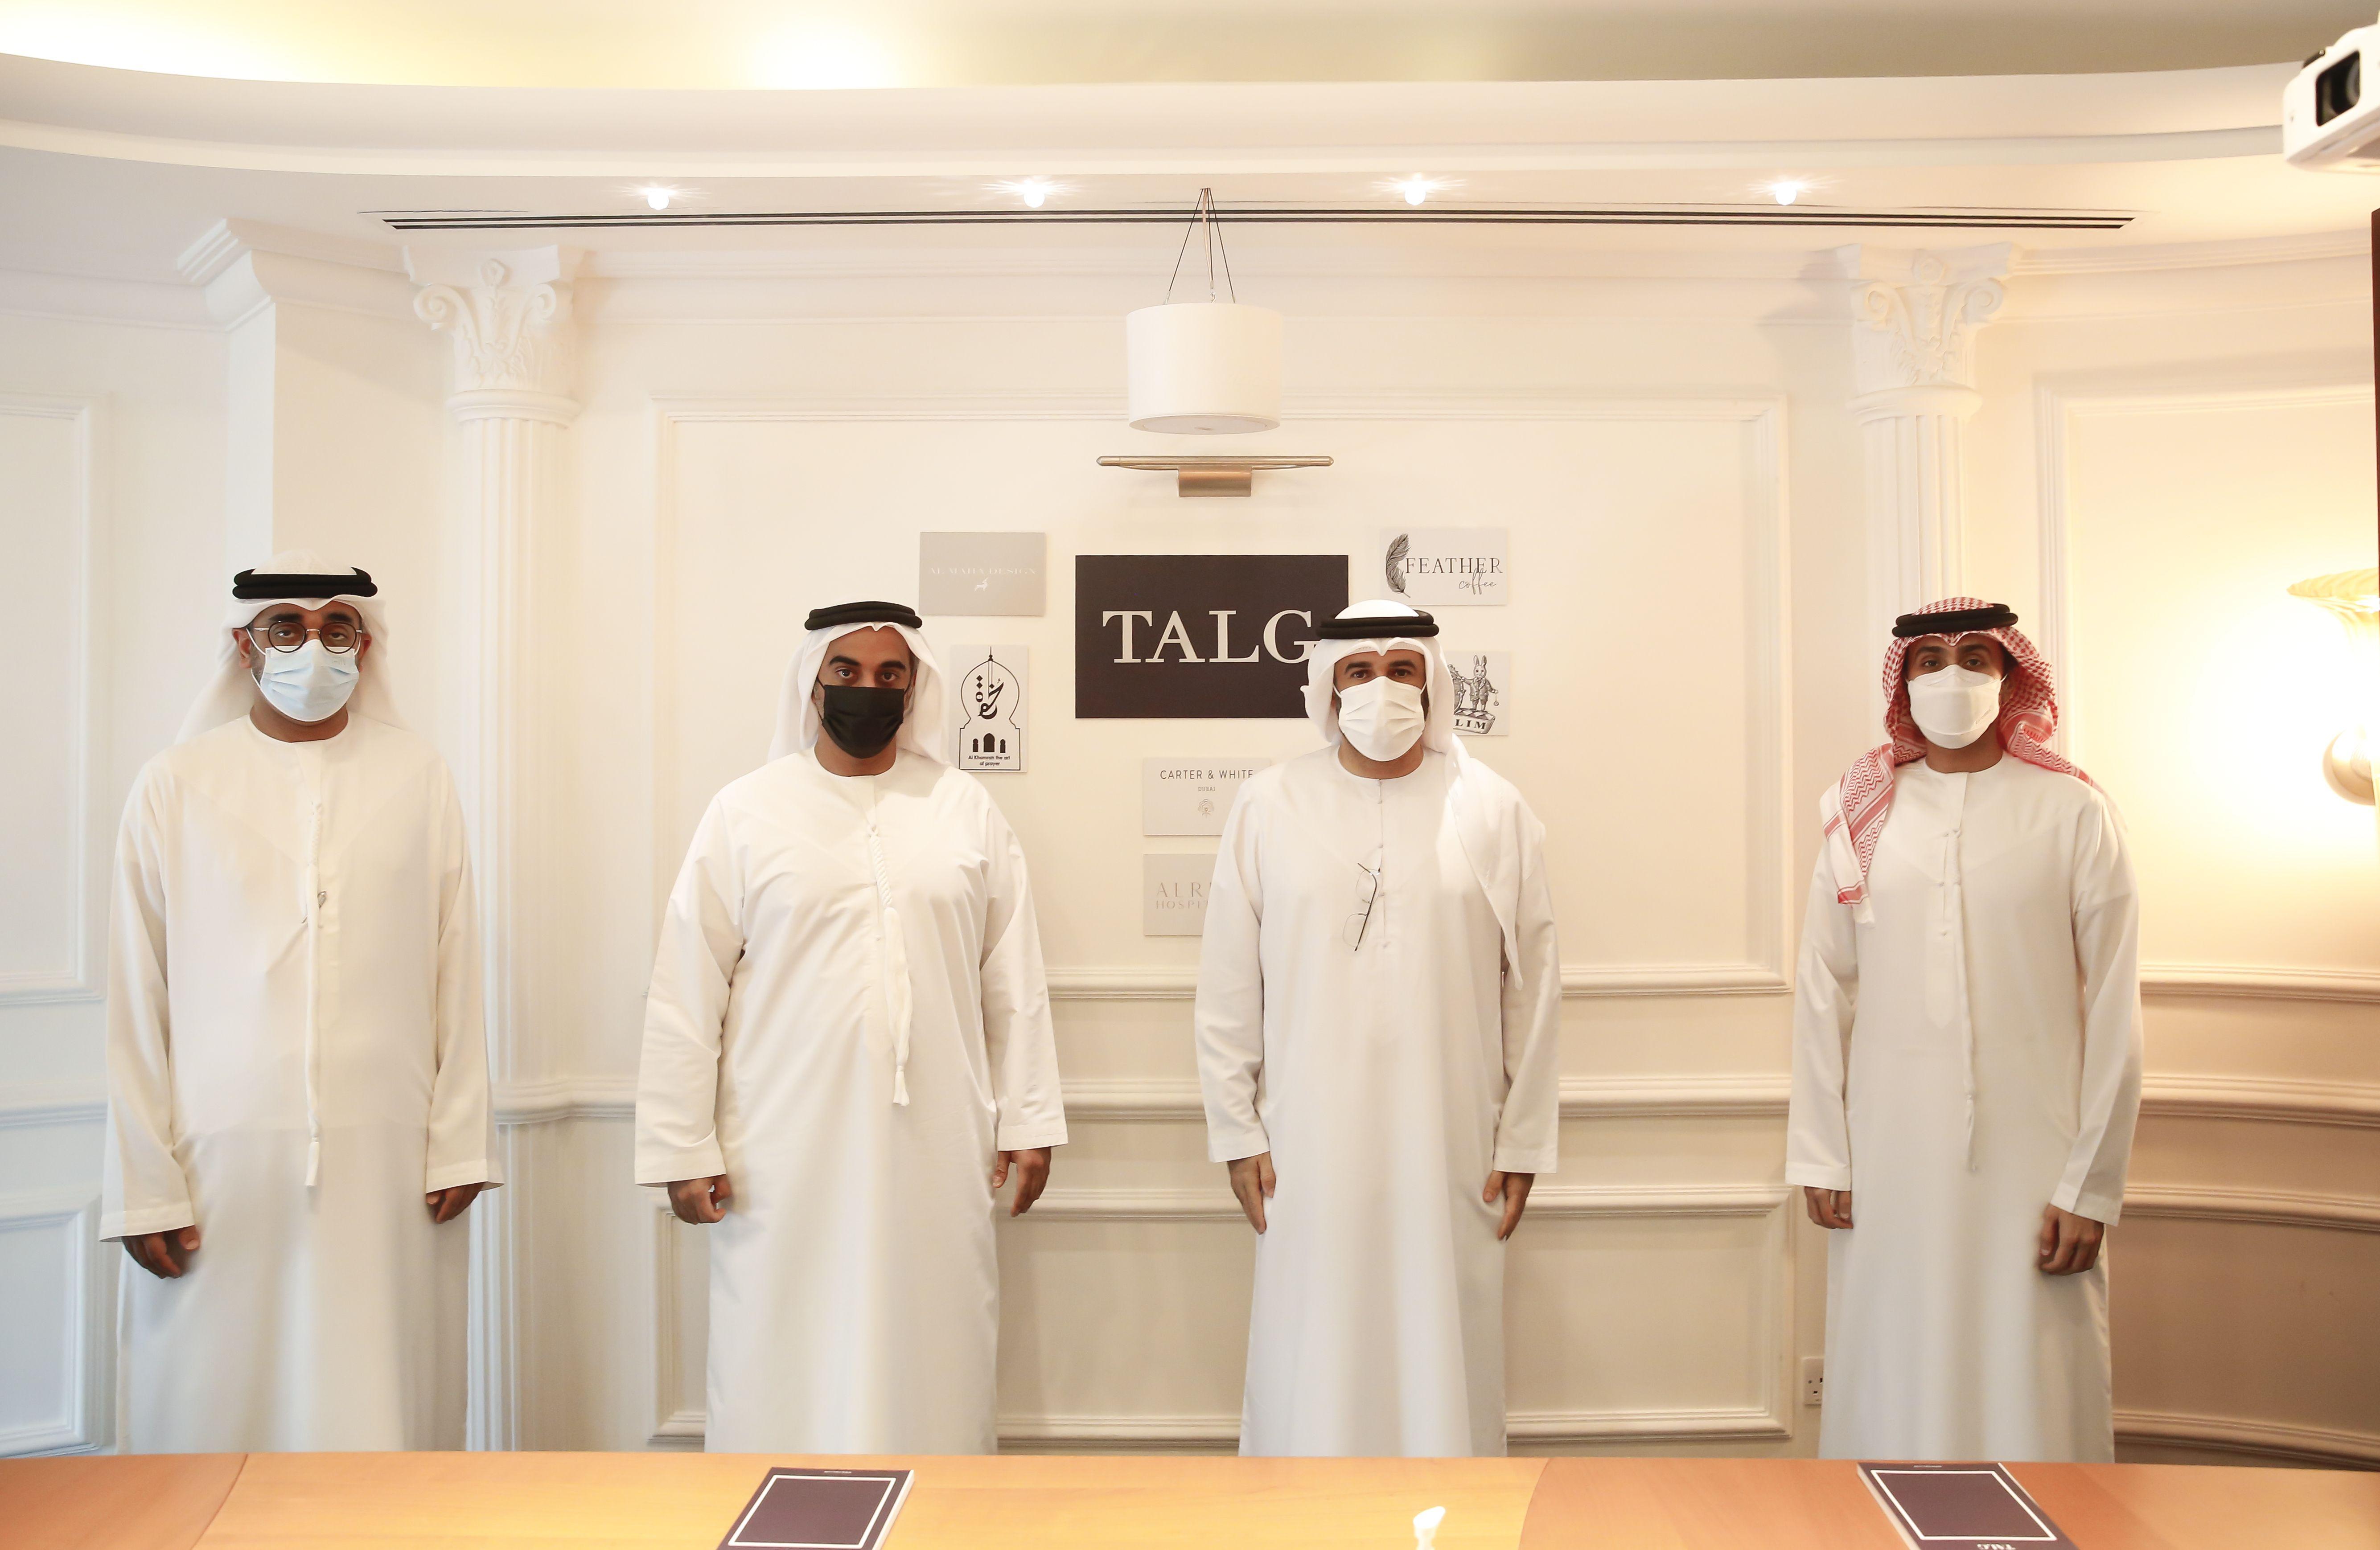 dubai-sme-the-arabian-luxury-group-joins-list-of-certified-business-incubators-under-dubai-business-incubator-network